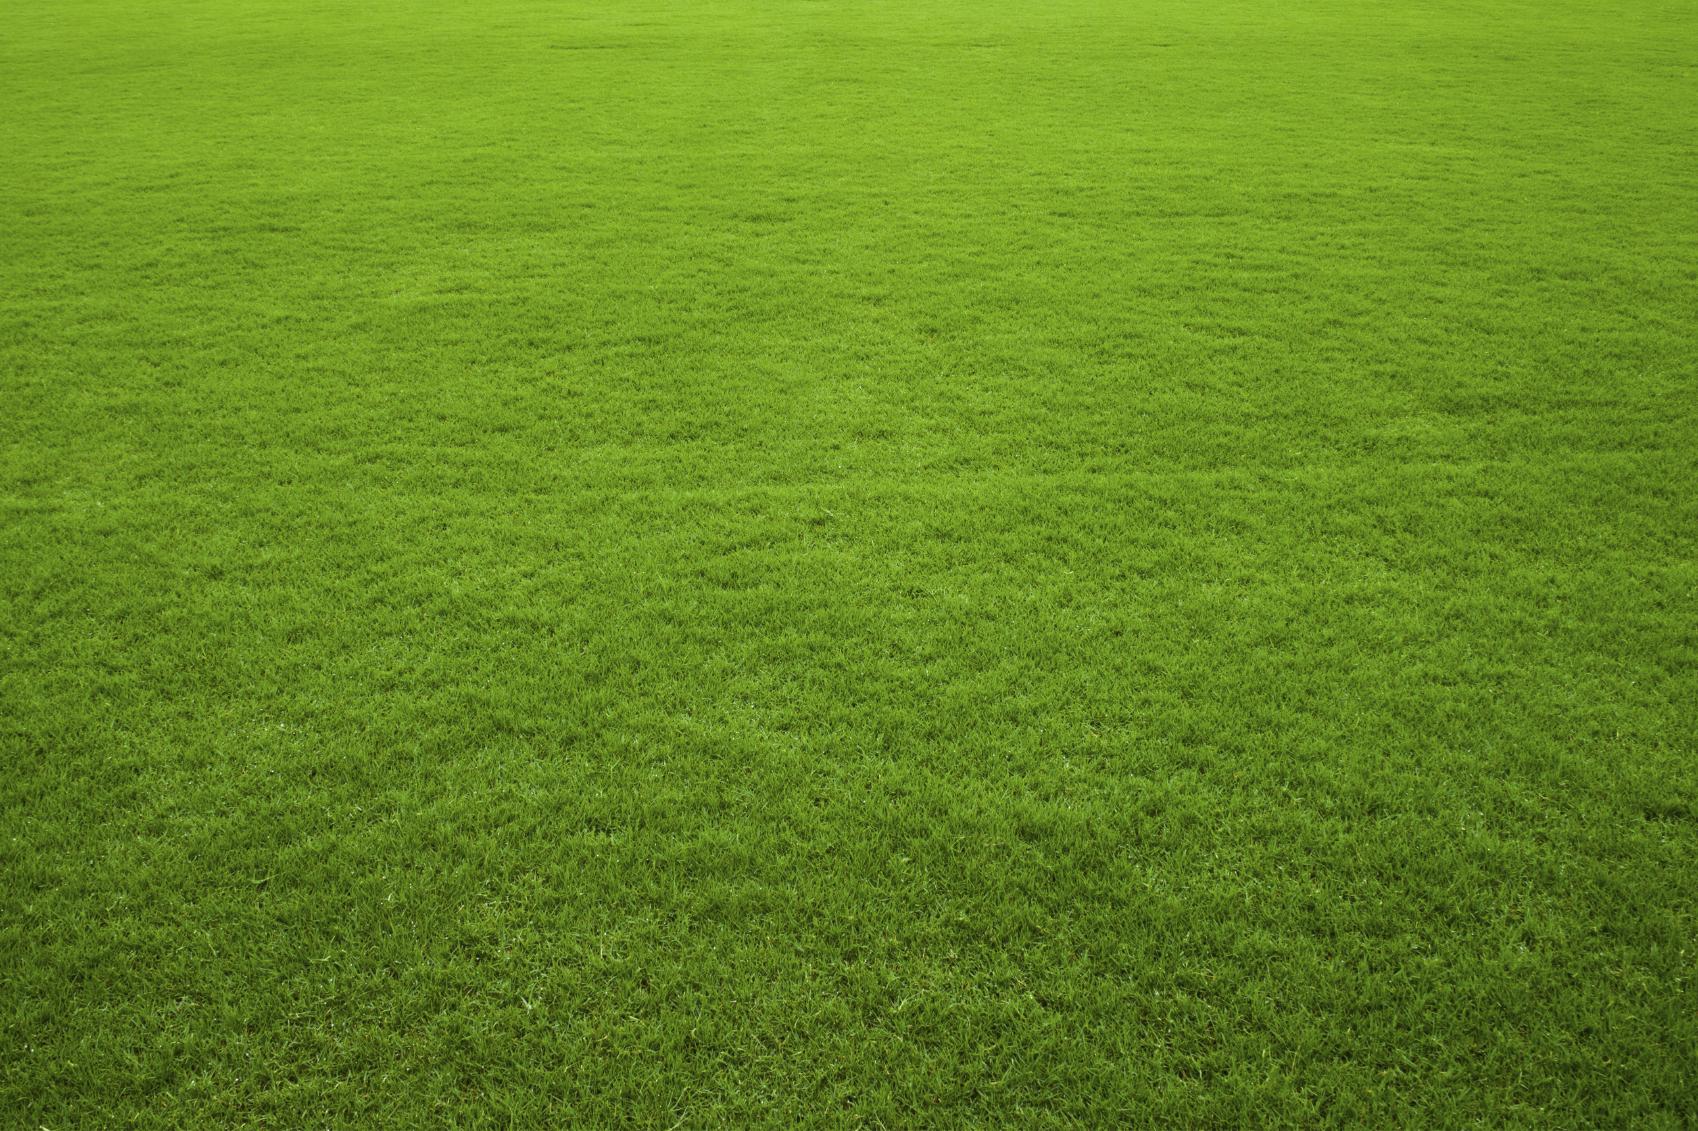 Apex Lawn Services